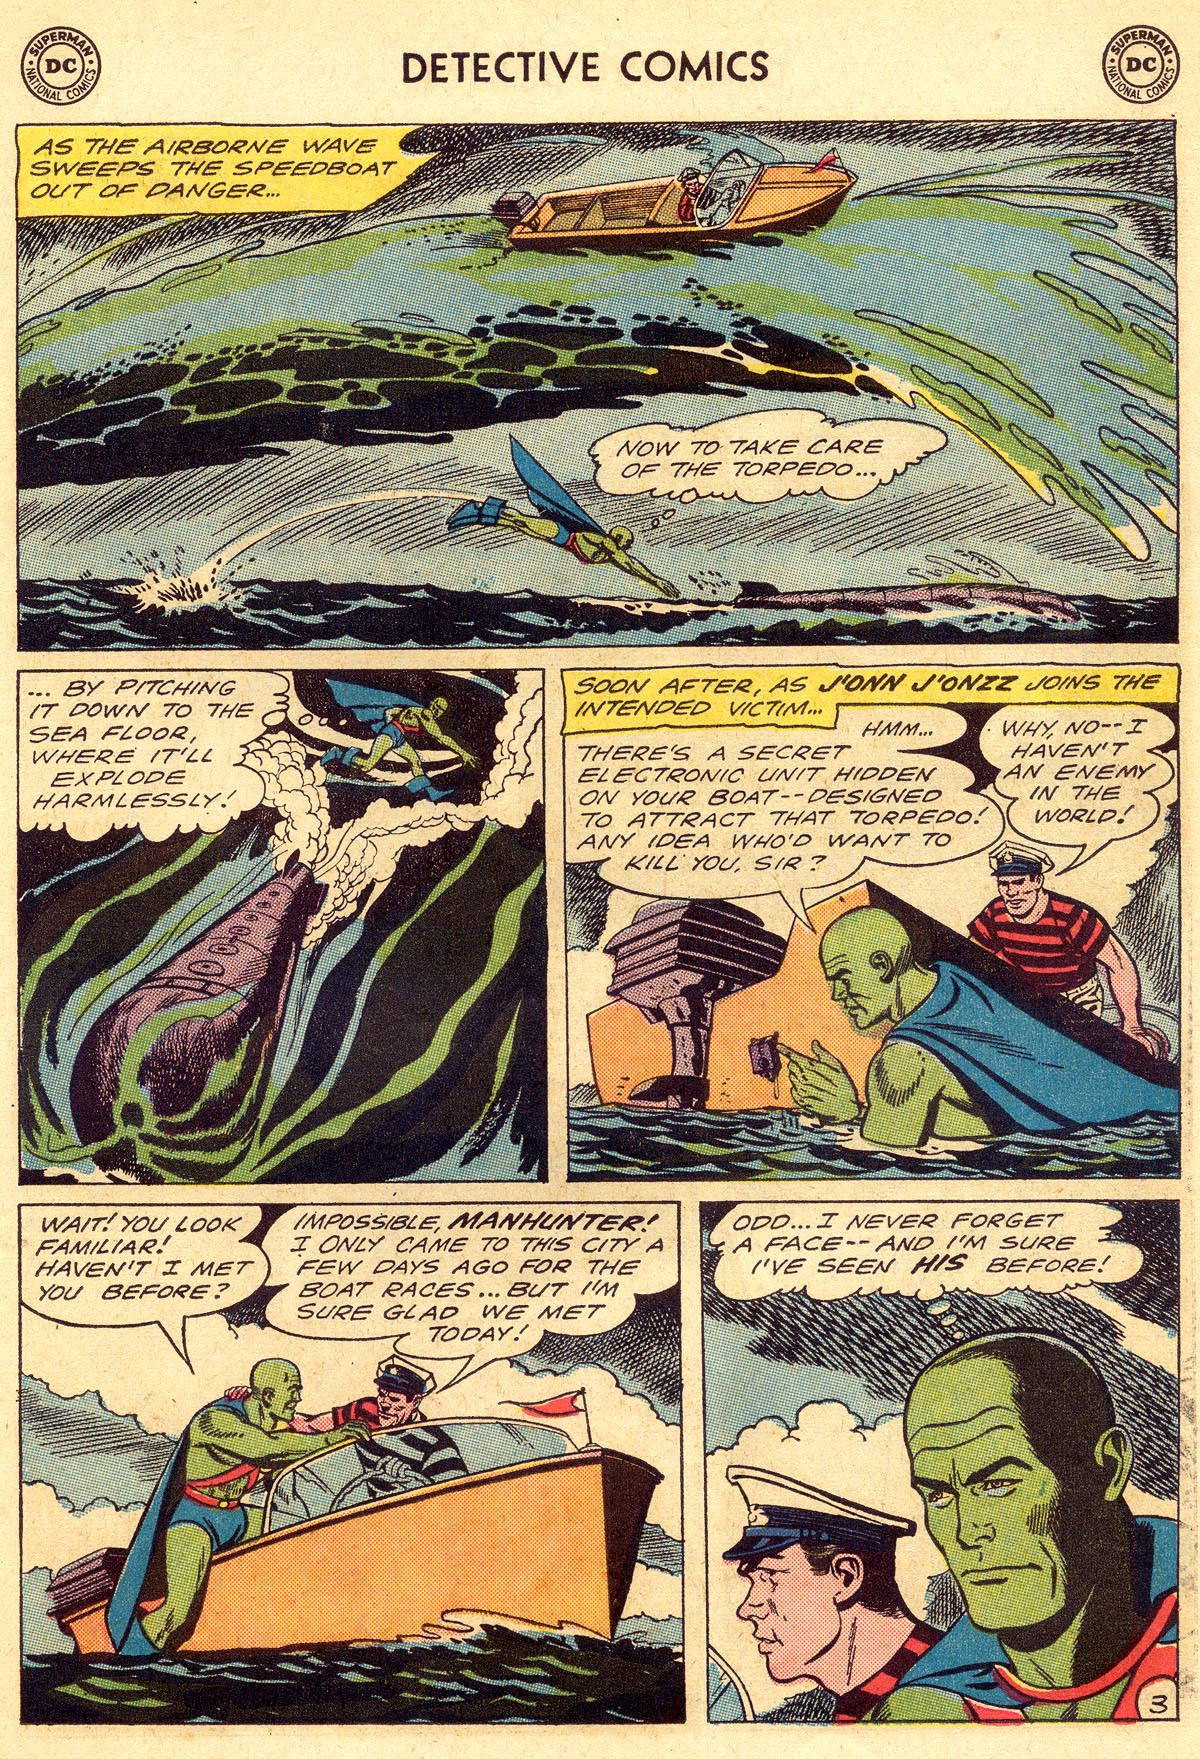 Detective Comics (1937) 303 Page 22